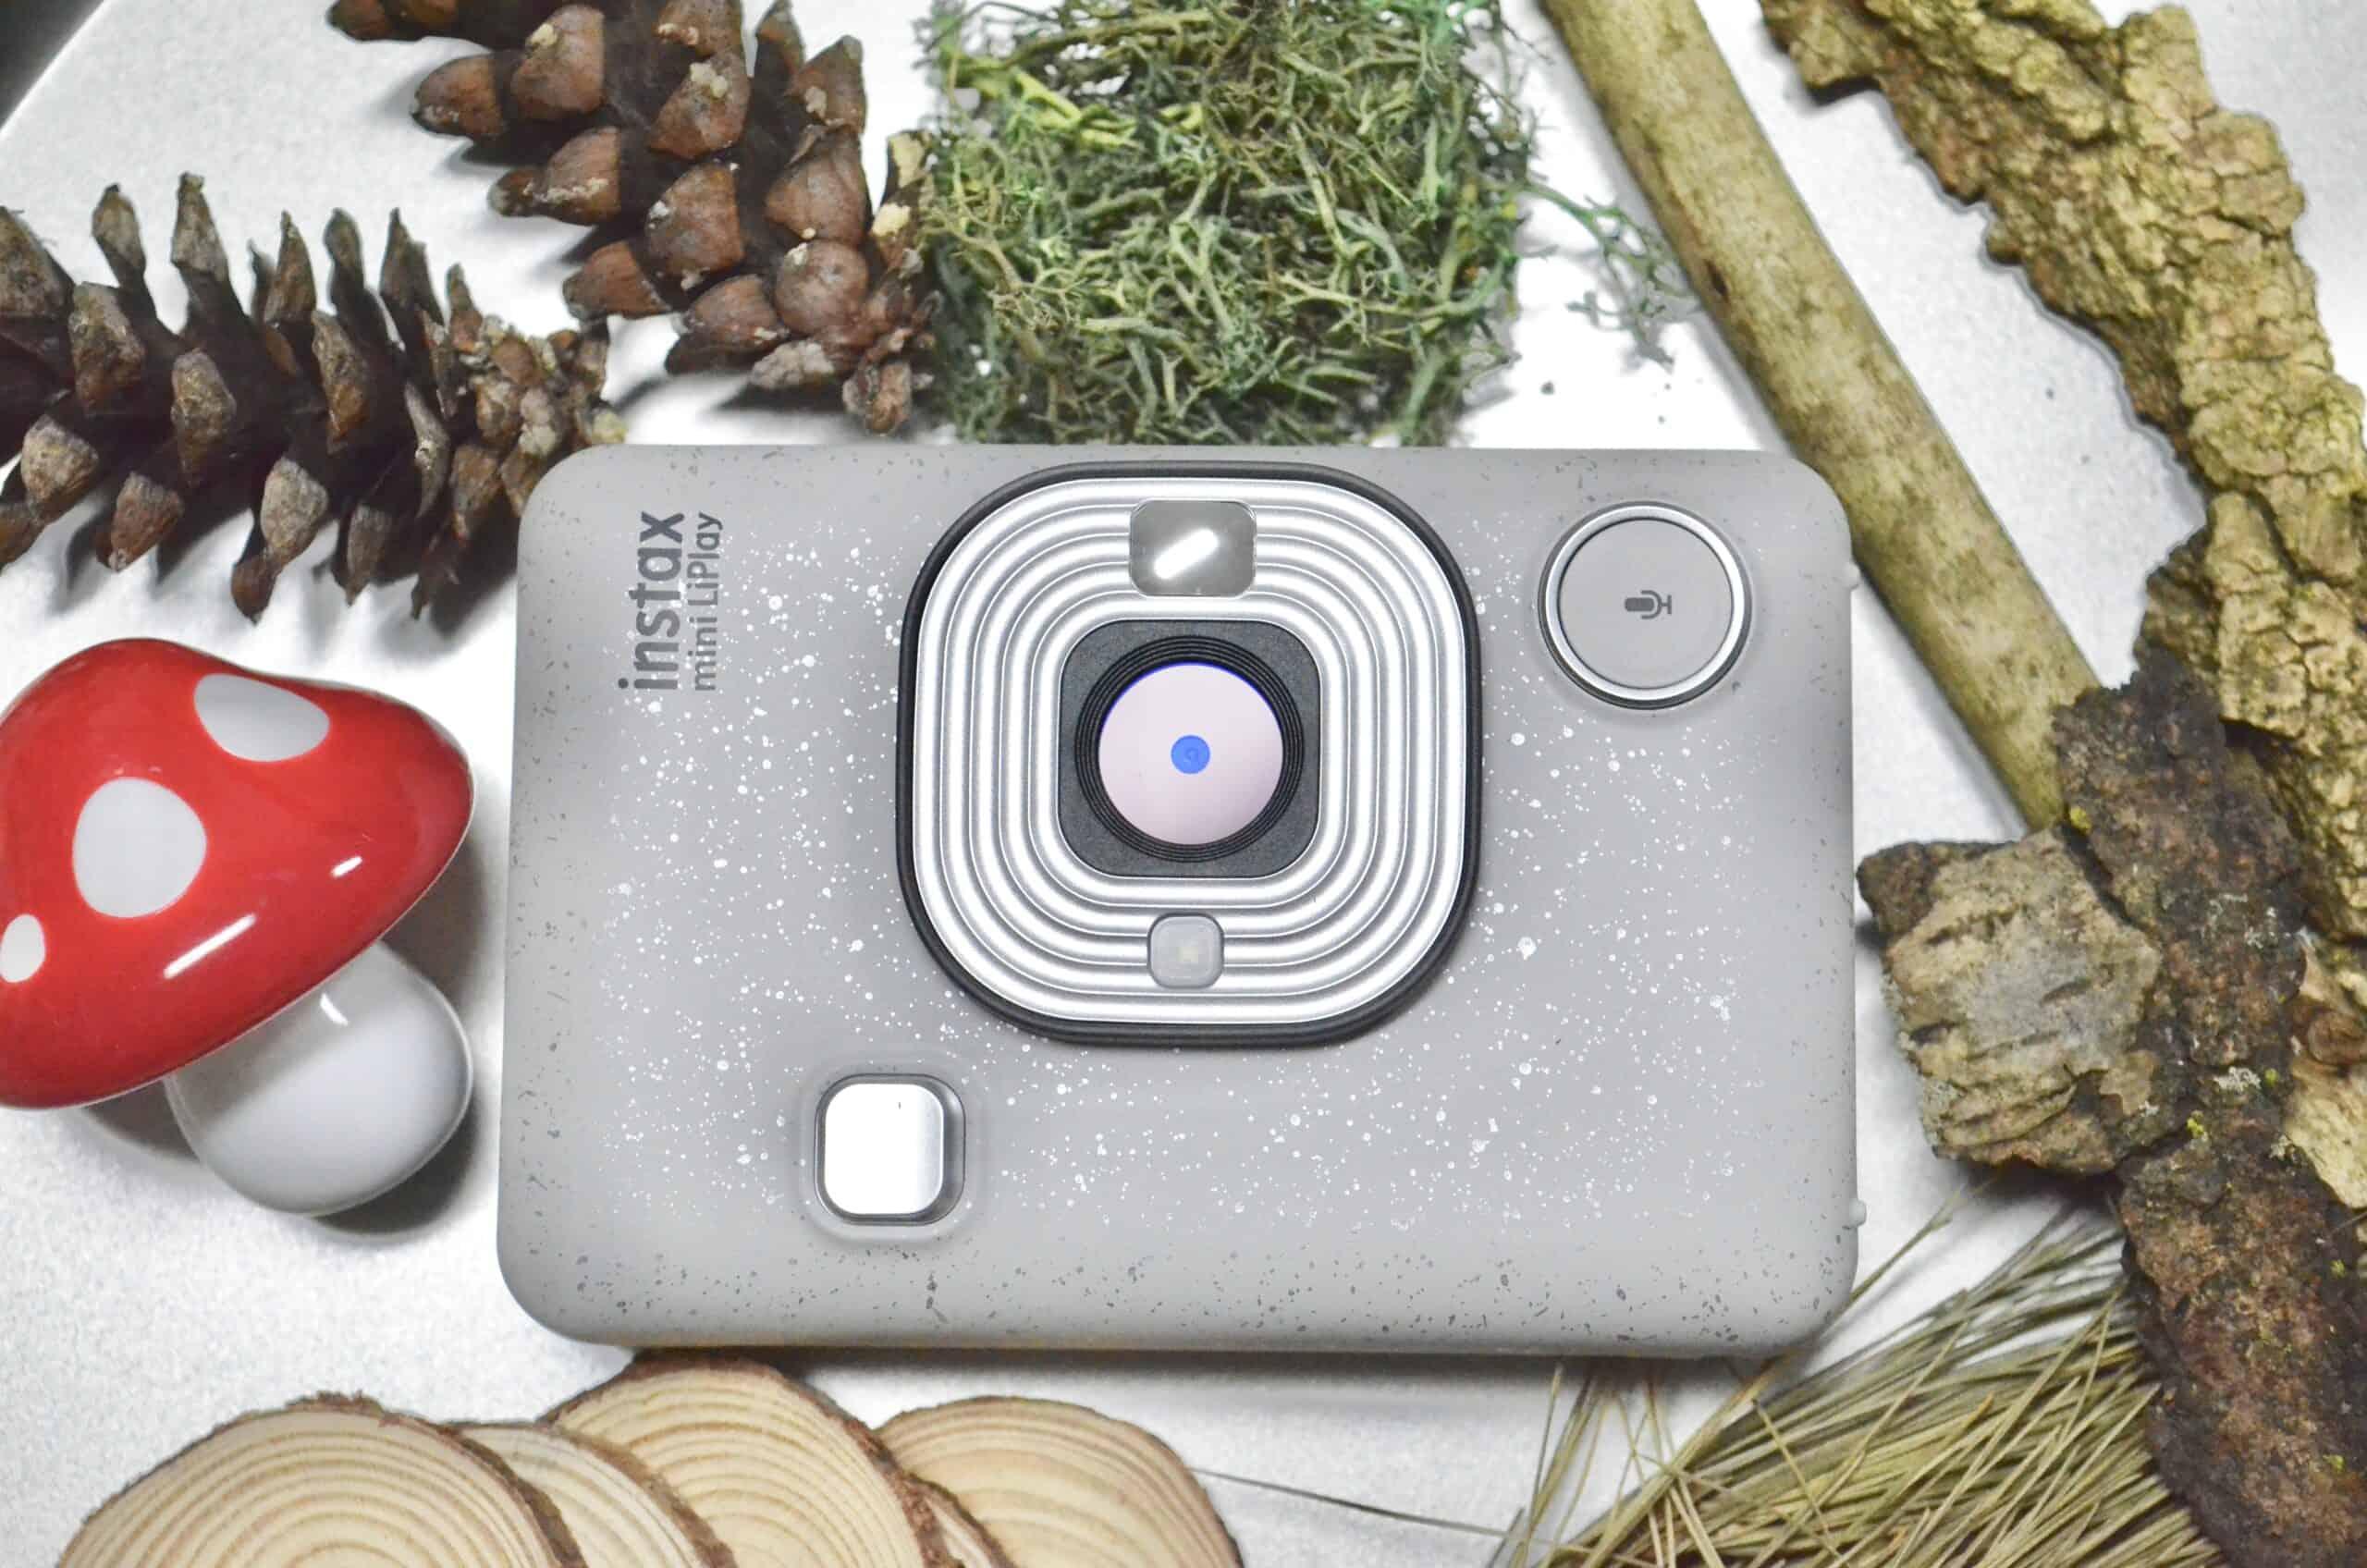 Fujifilm INSTAX mini LiPlay camera